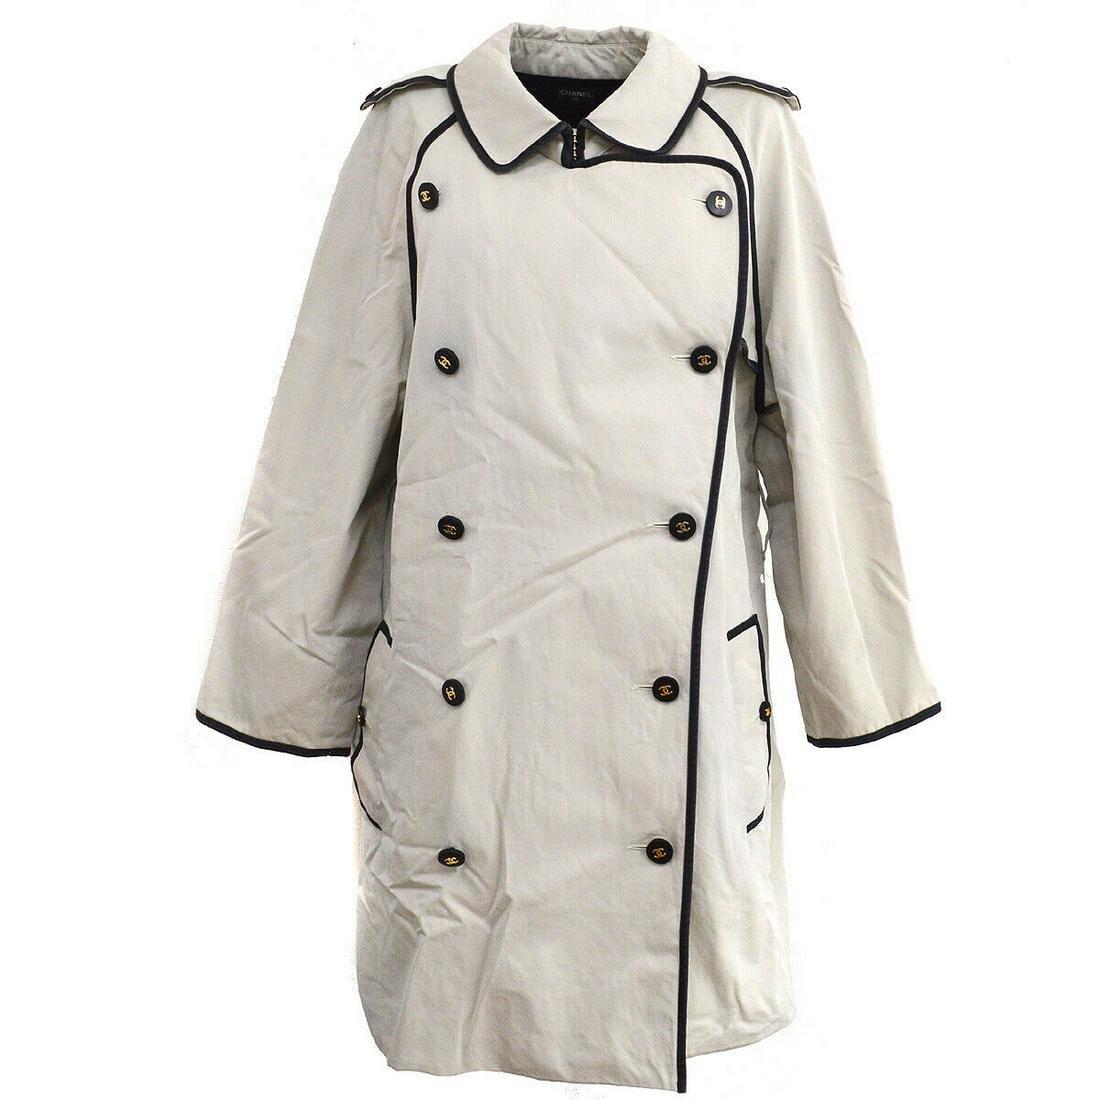 Authentic CHANEL 100% Cotton Jacket